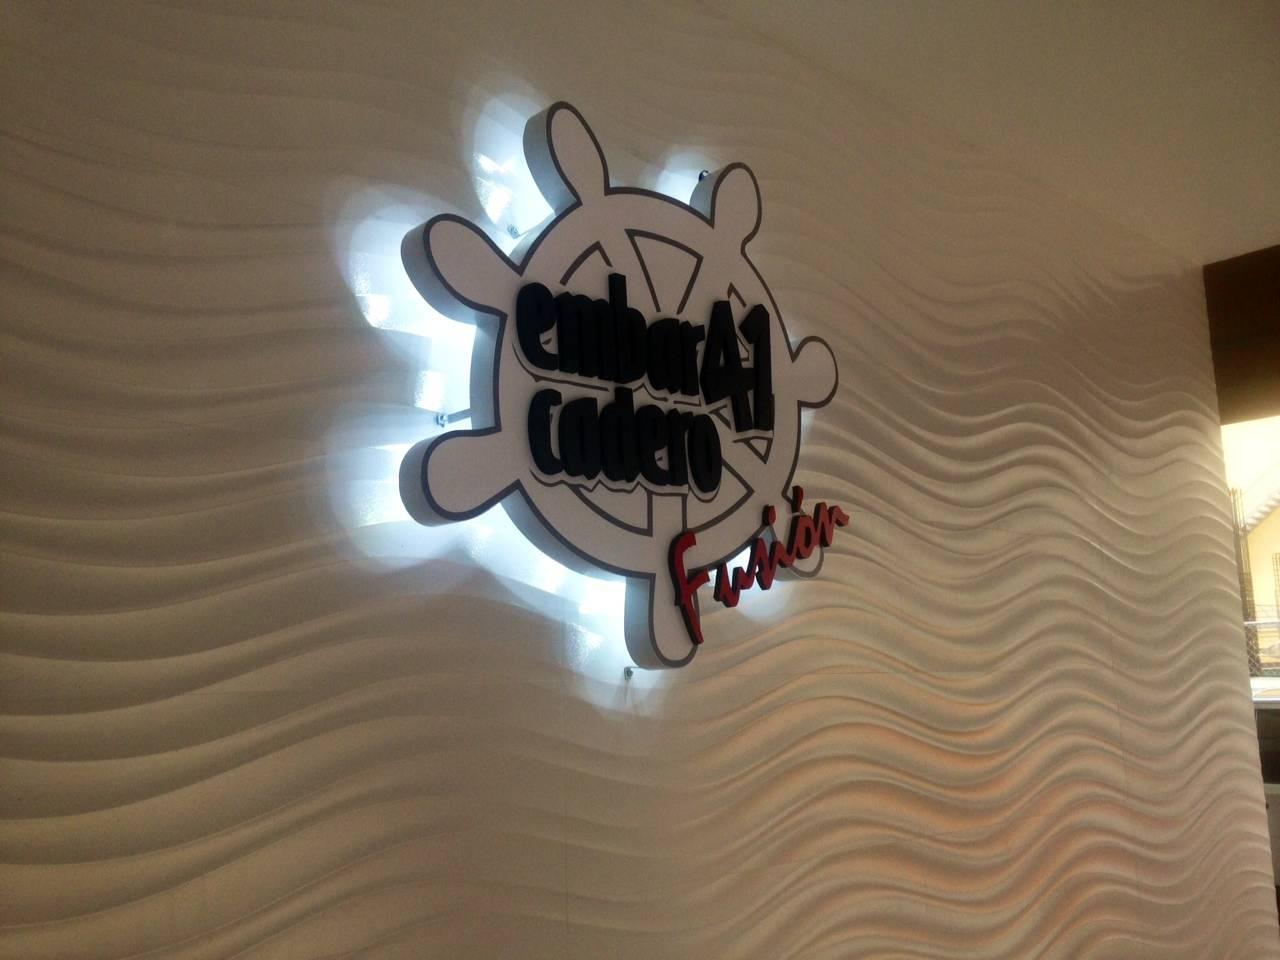 Back lit channel logo